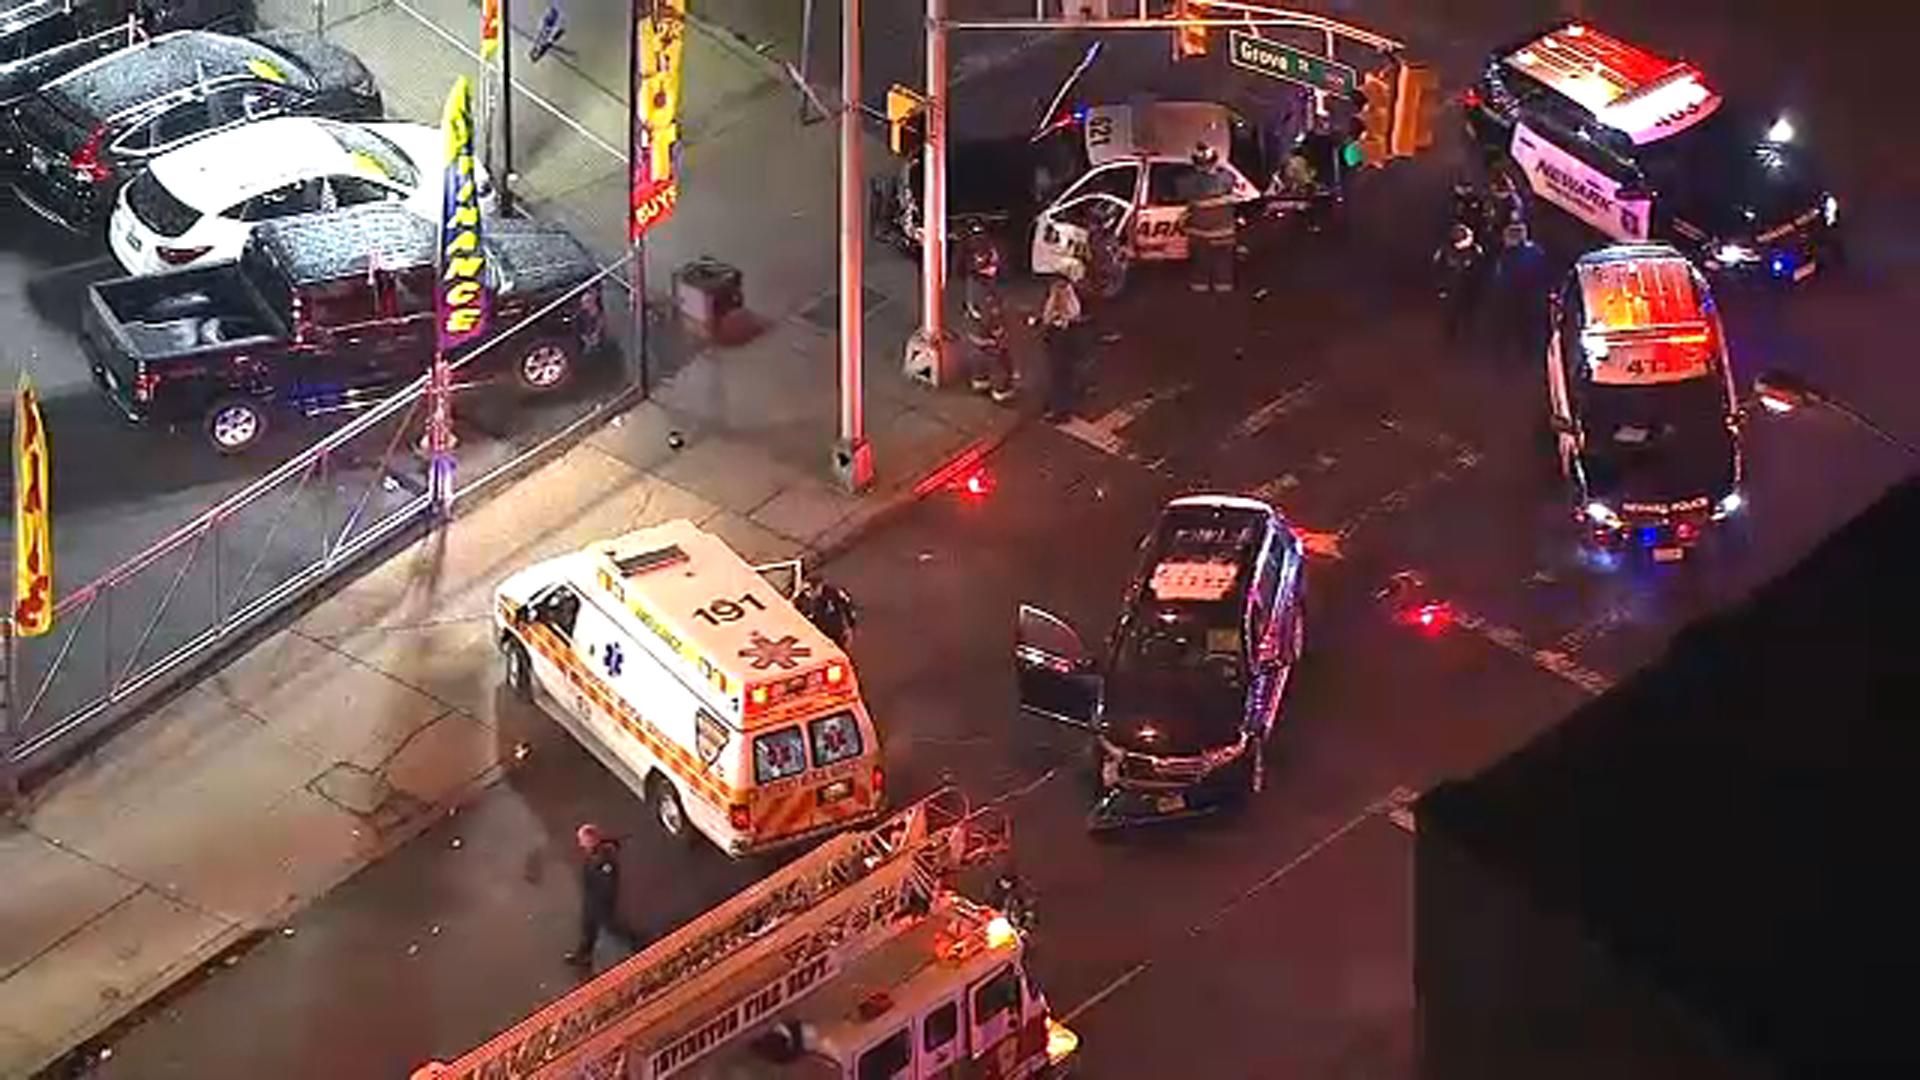 2 officers, 1 civilian hurt when Newark police cruiser crashes in Irvington